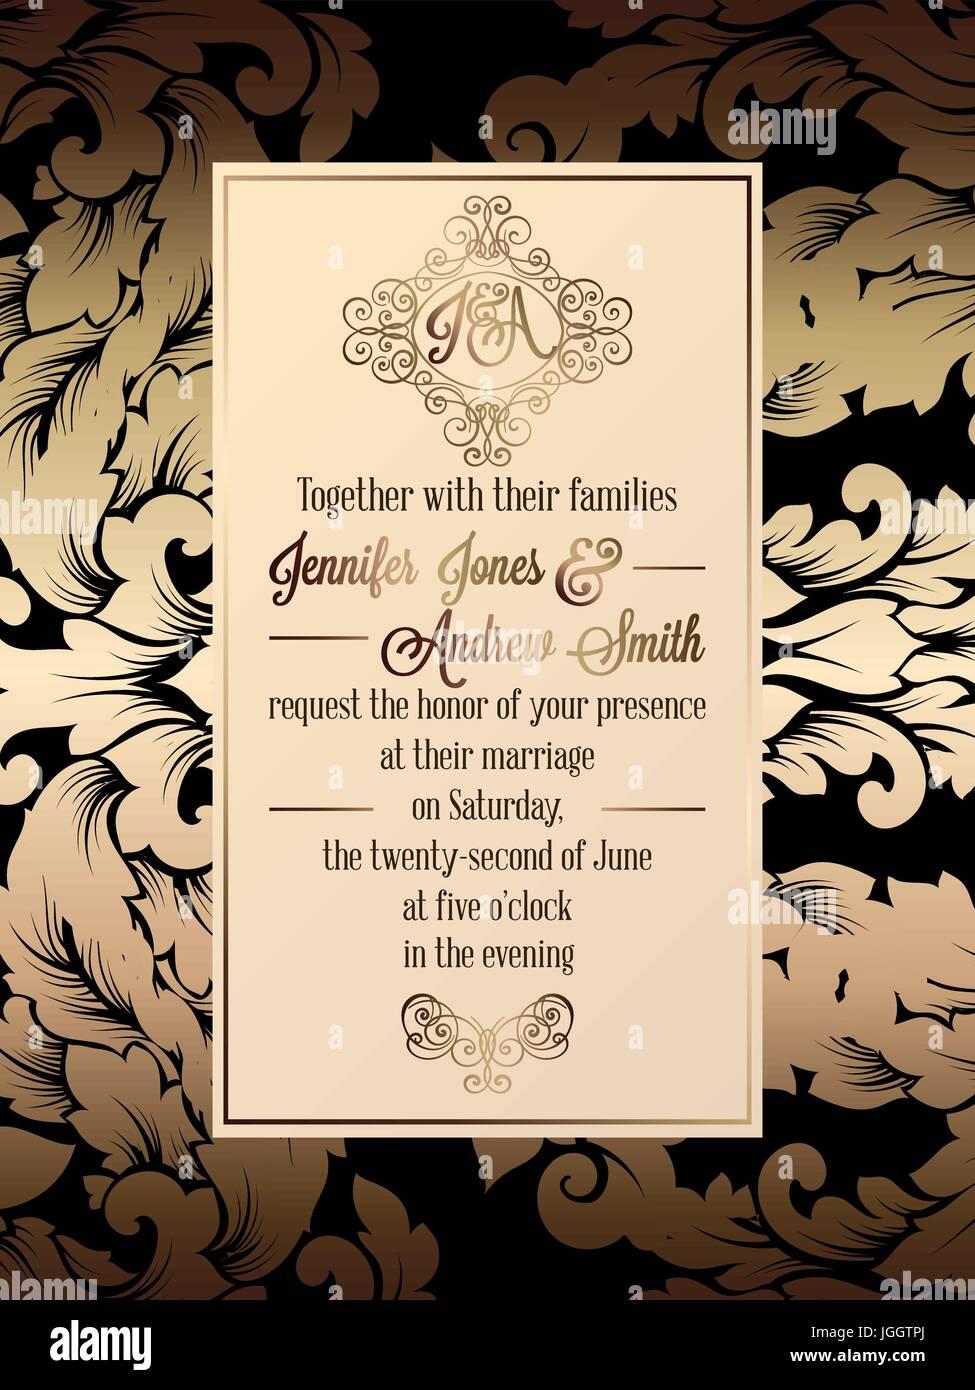 Vintage baroque style wedding invitation card template elegant vintage baroque style wedding invitation card template elegant formal design with damask background traditional decoration for wedding gold on bla stopboris Choice Image